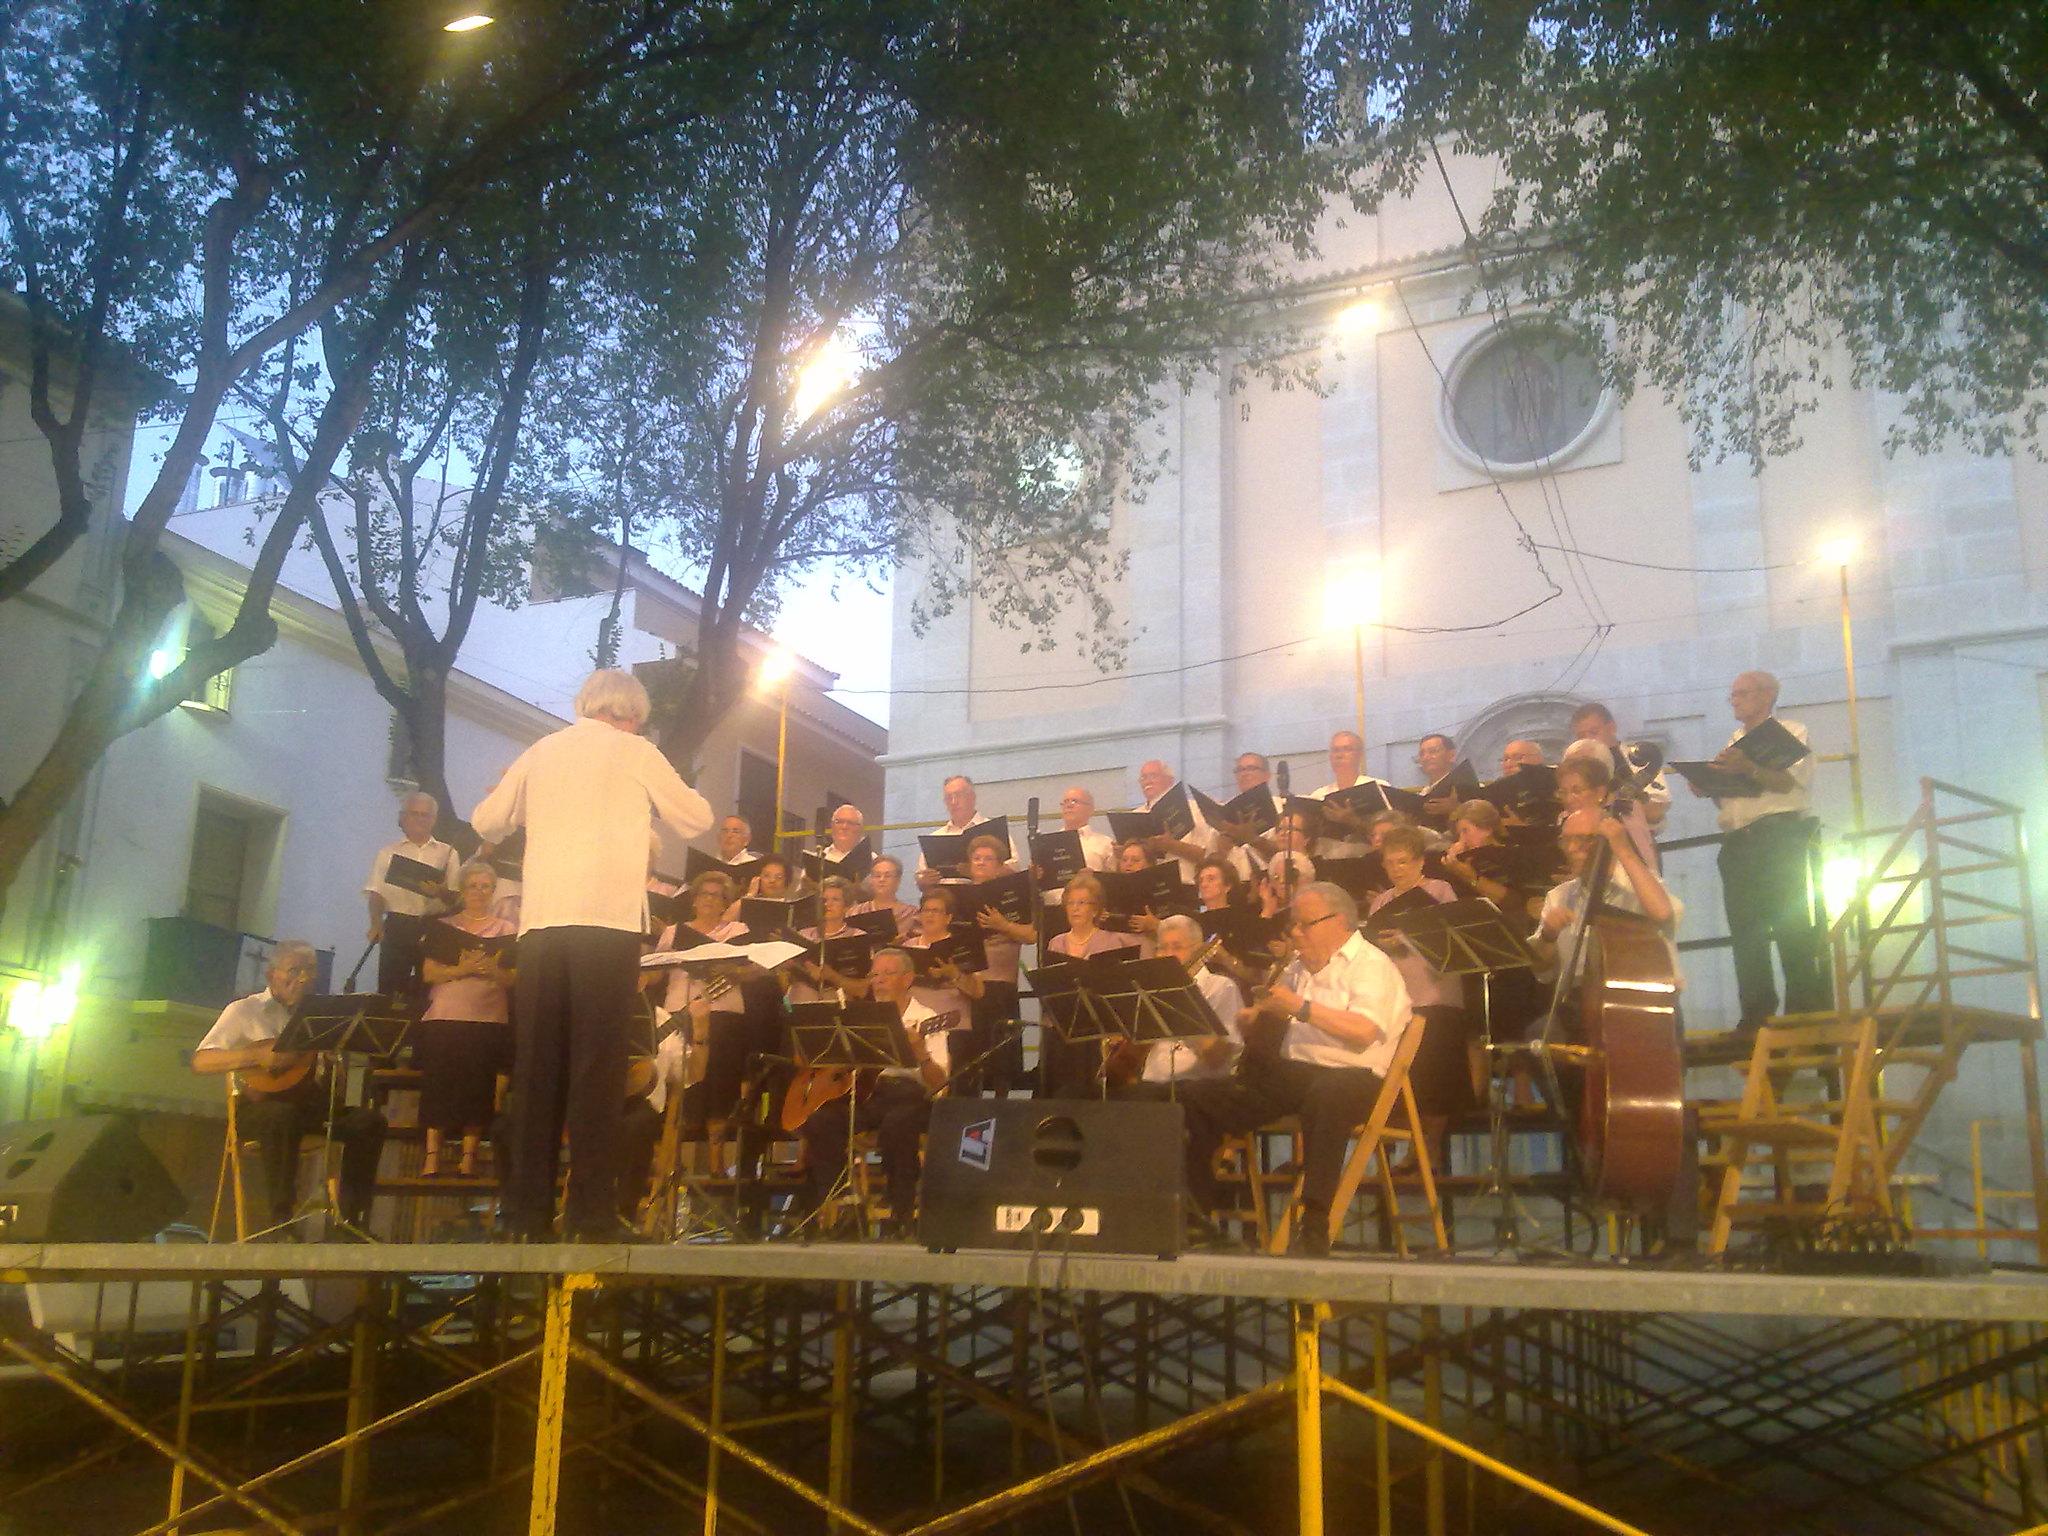 (2012-06-29) - Cocierto Rondalla CEAM - José vicente Romero Ripoll (06)